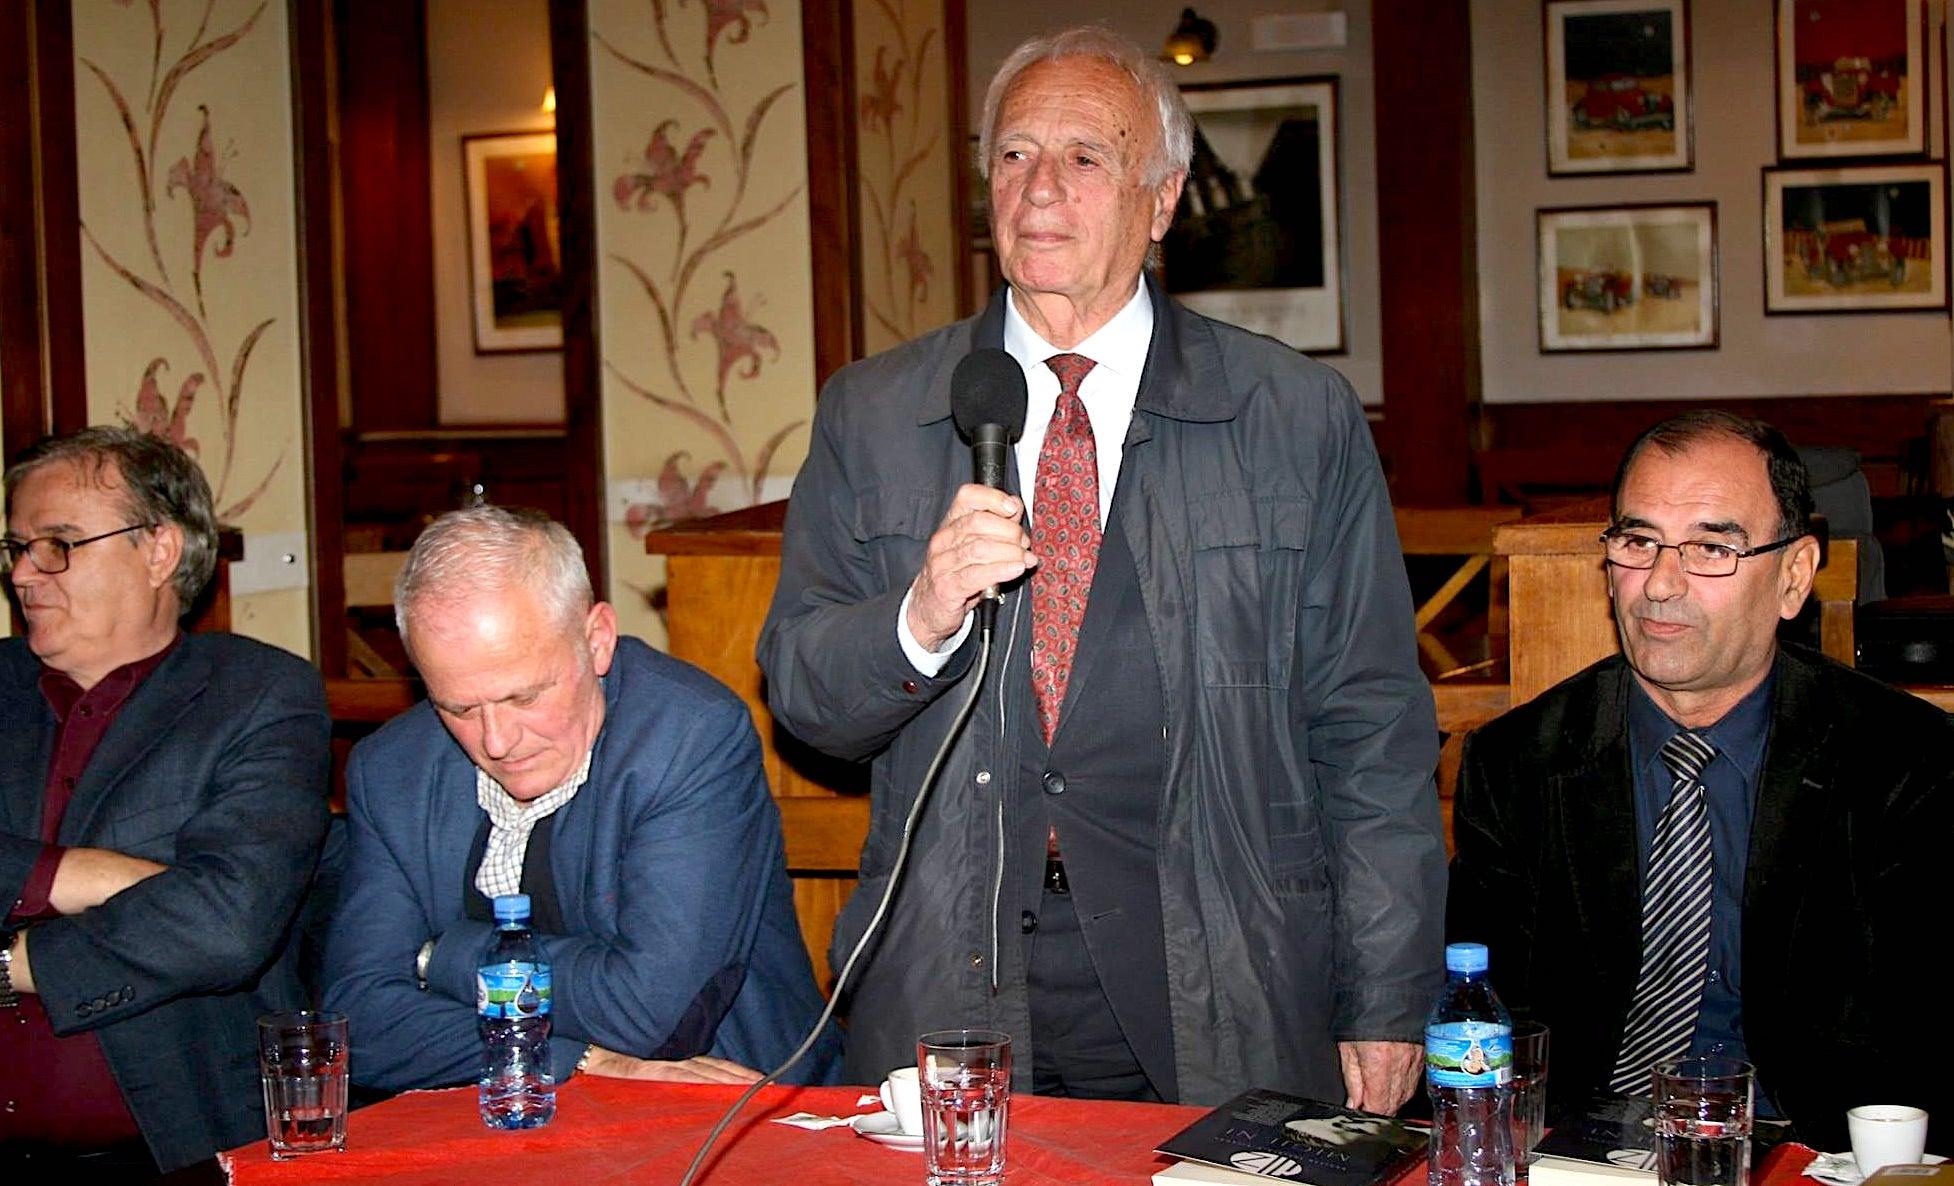 Shkrimtari Agim Gjakova midis Rexhep Shahut, Behar Gjokës dhe Izet Durakut